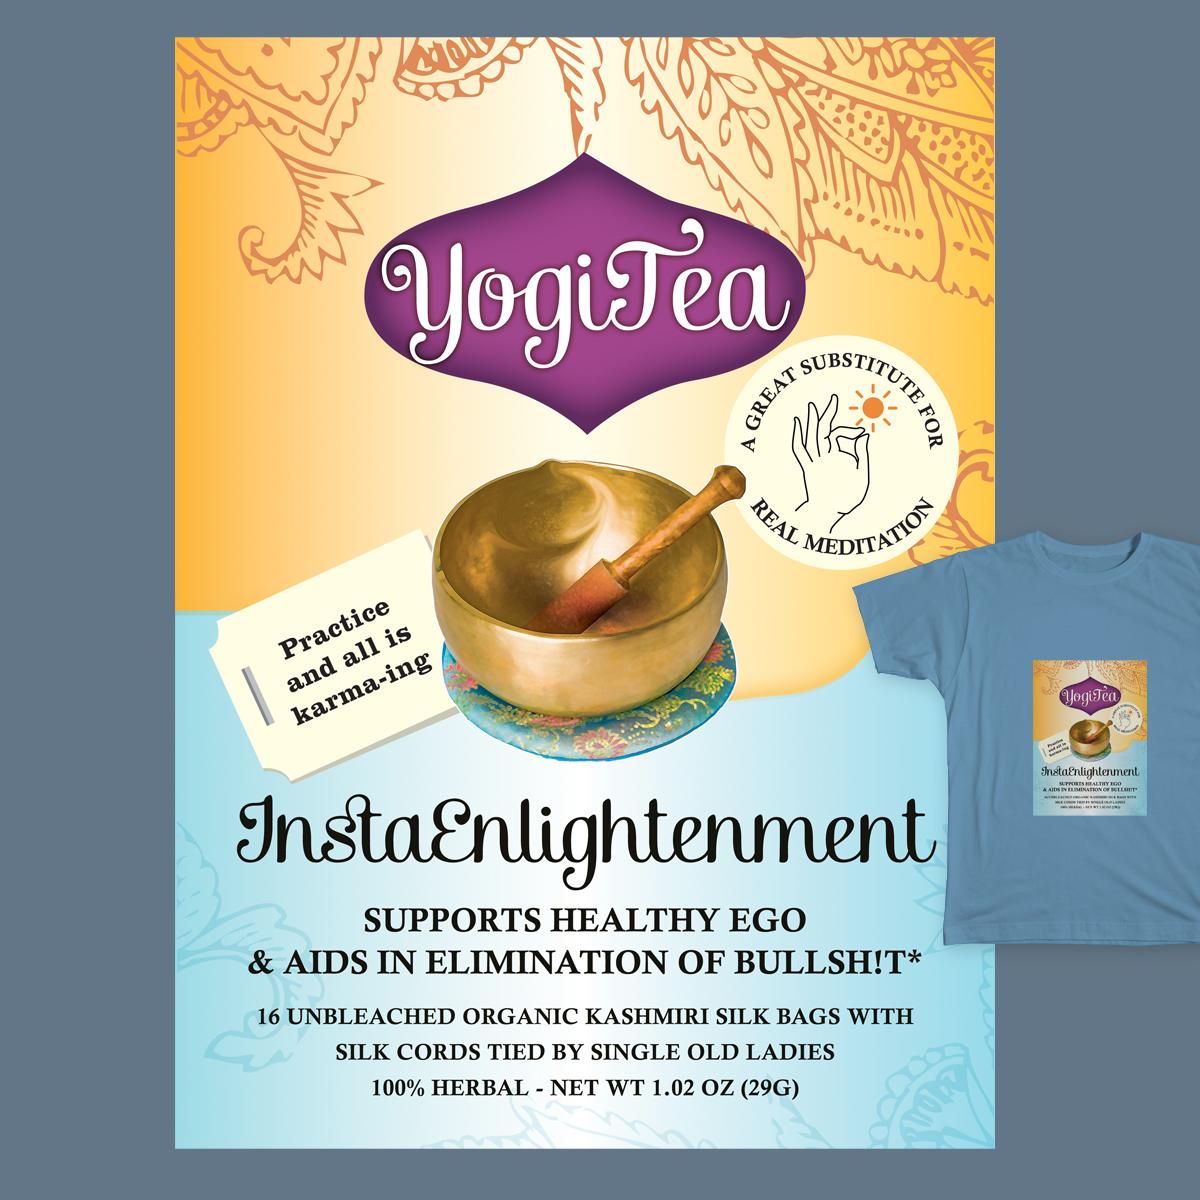 InstaEnlightenment Tea by inkypots on Threadless